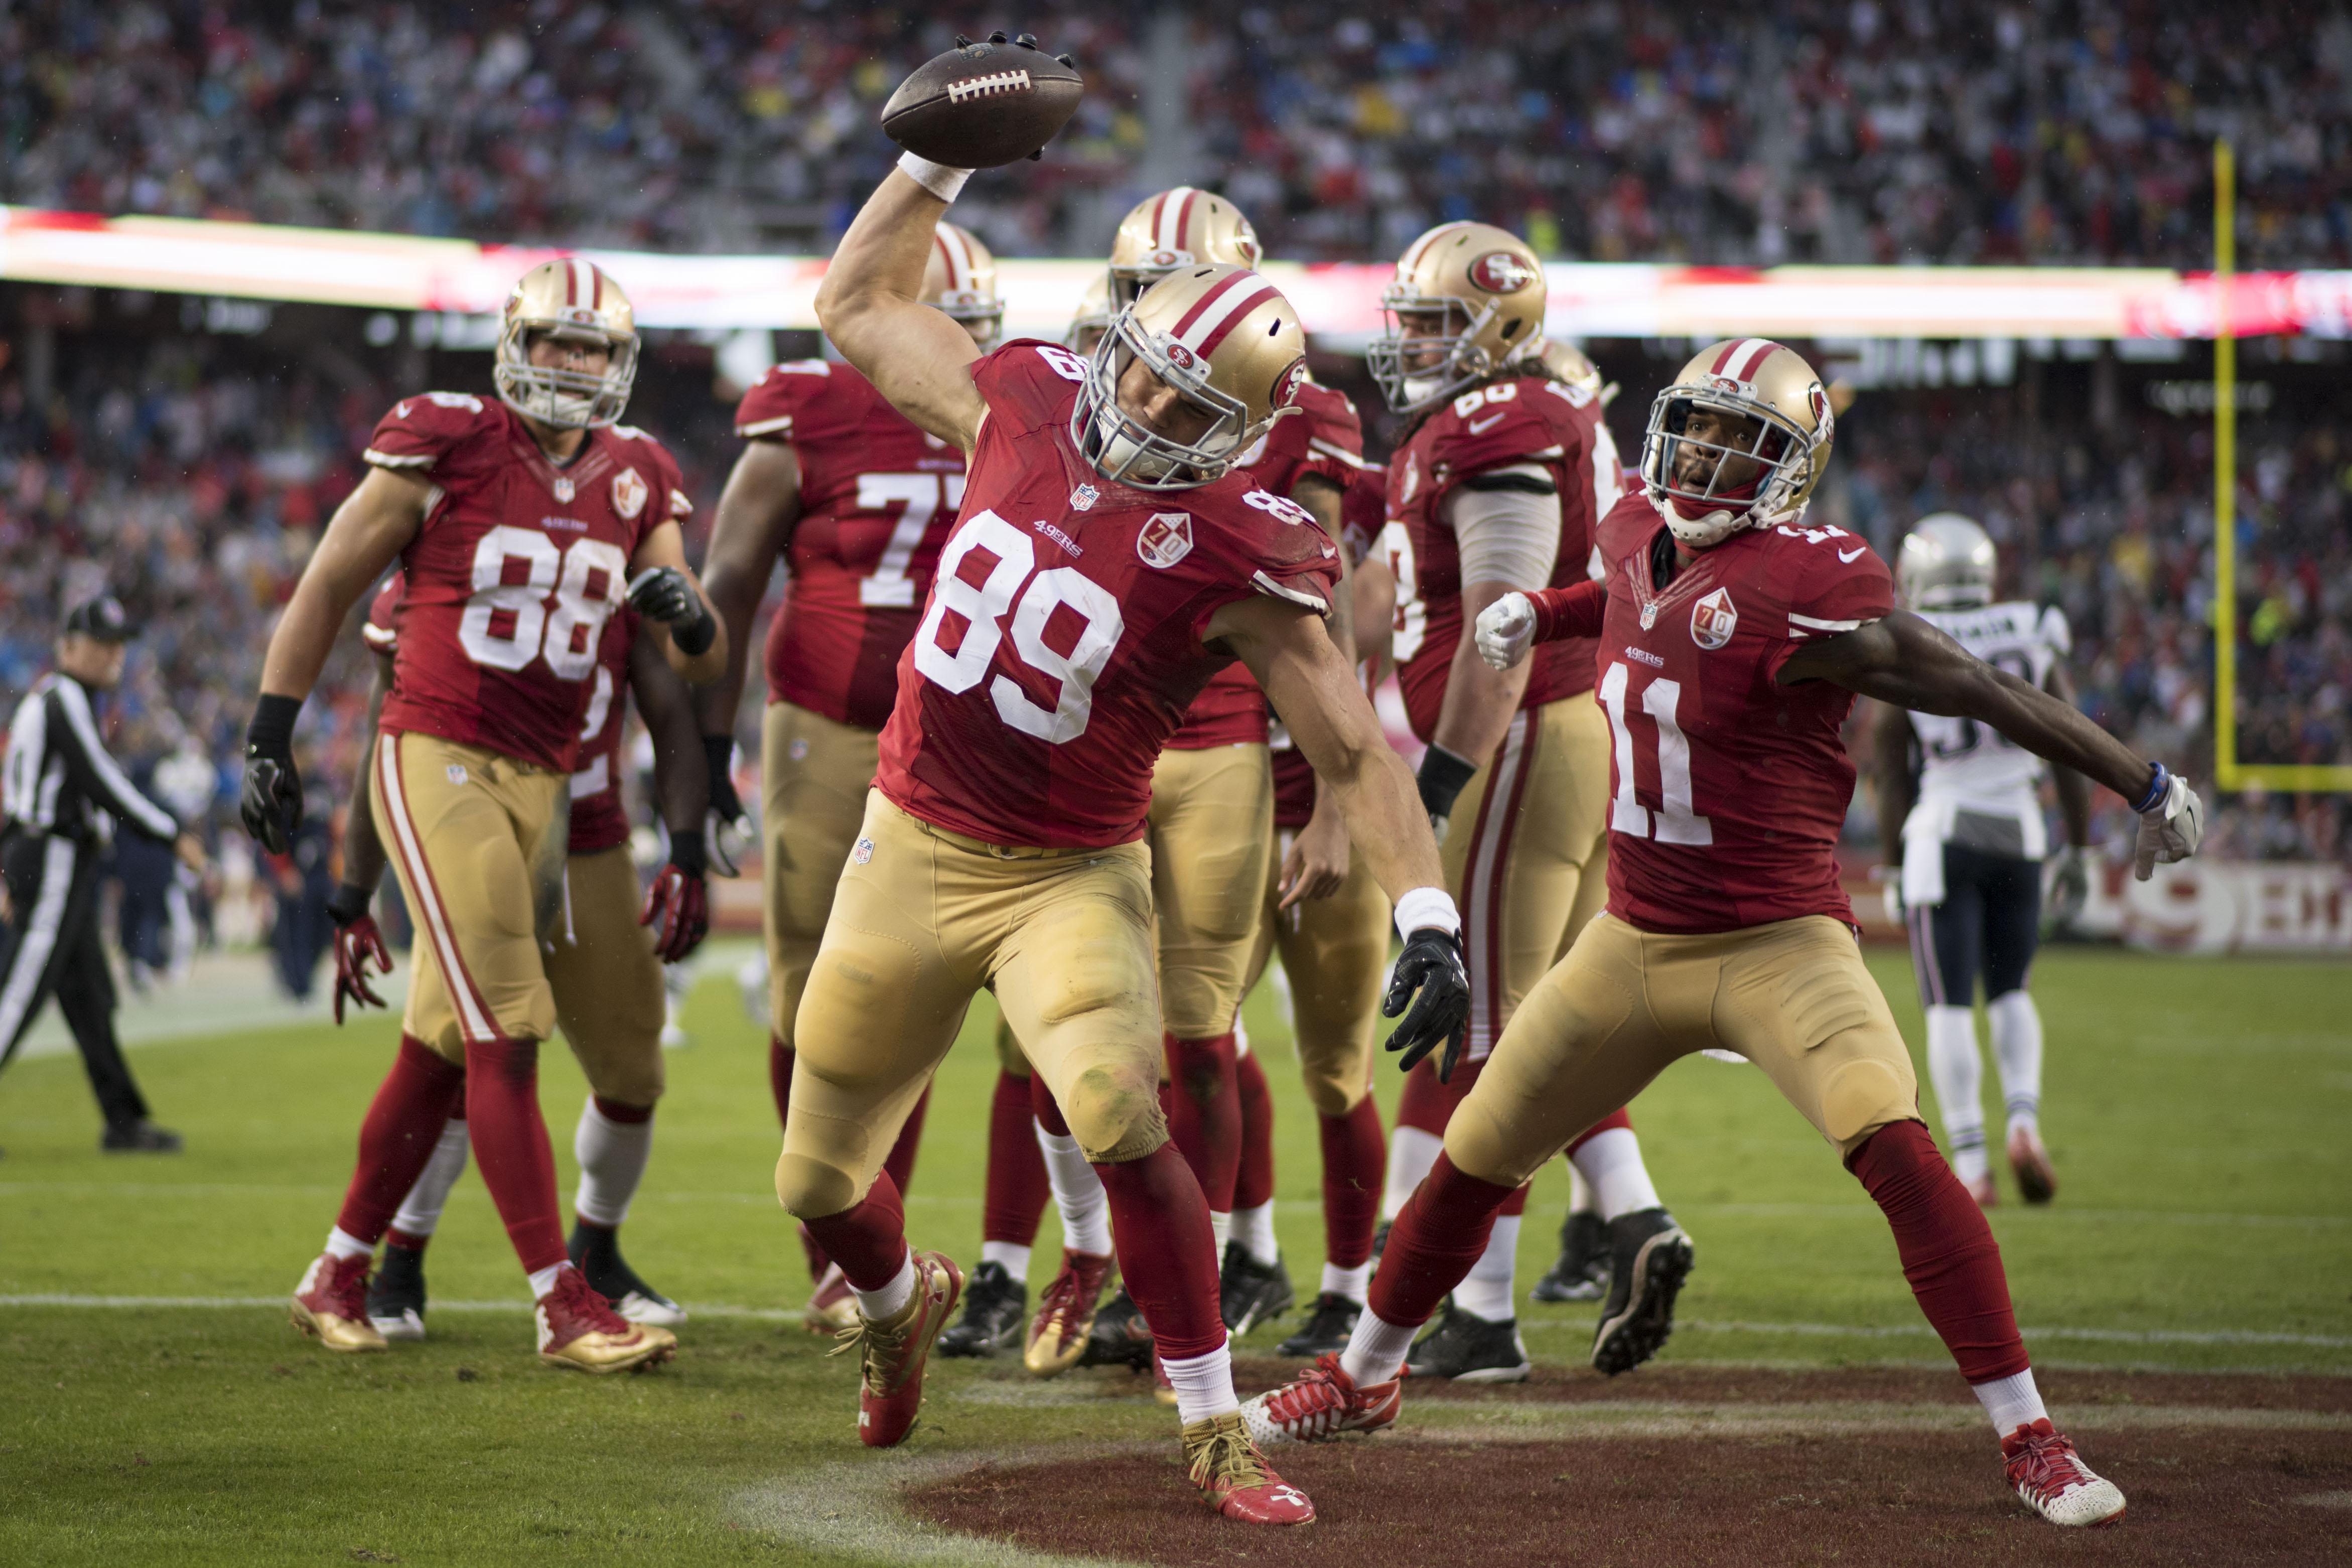 NFL: New England Patriots at San Francisco 49ers